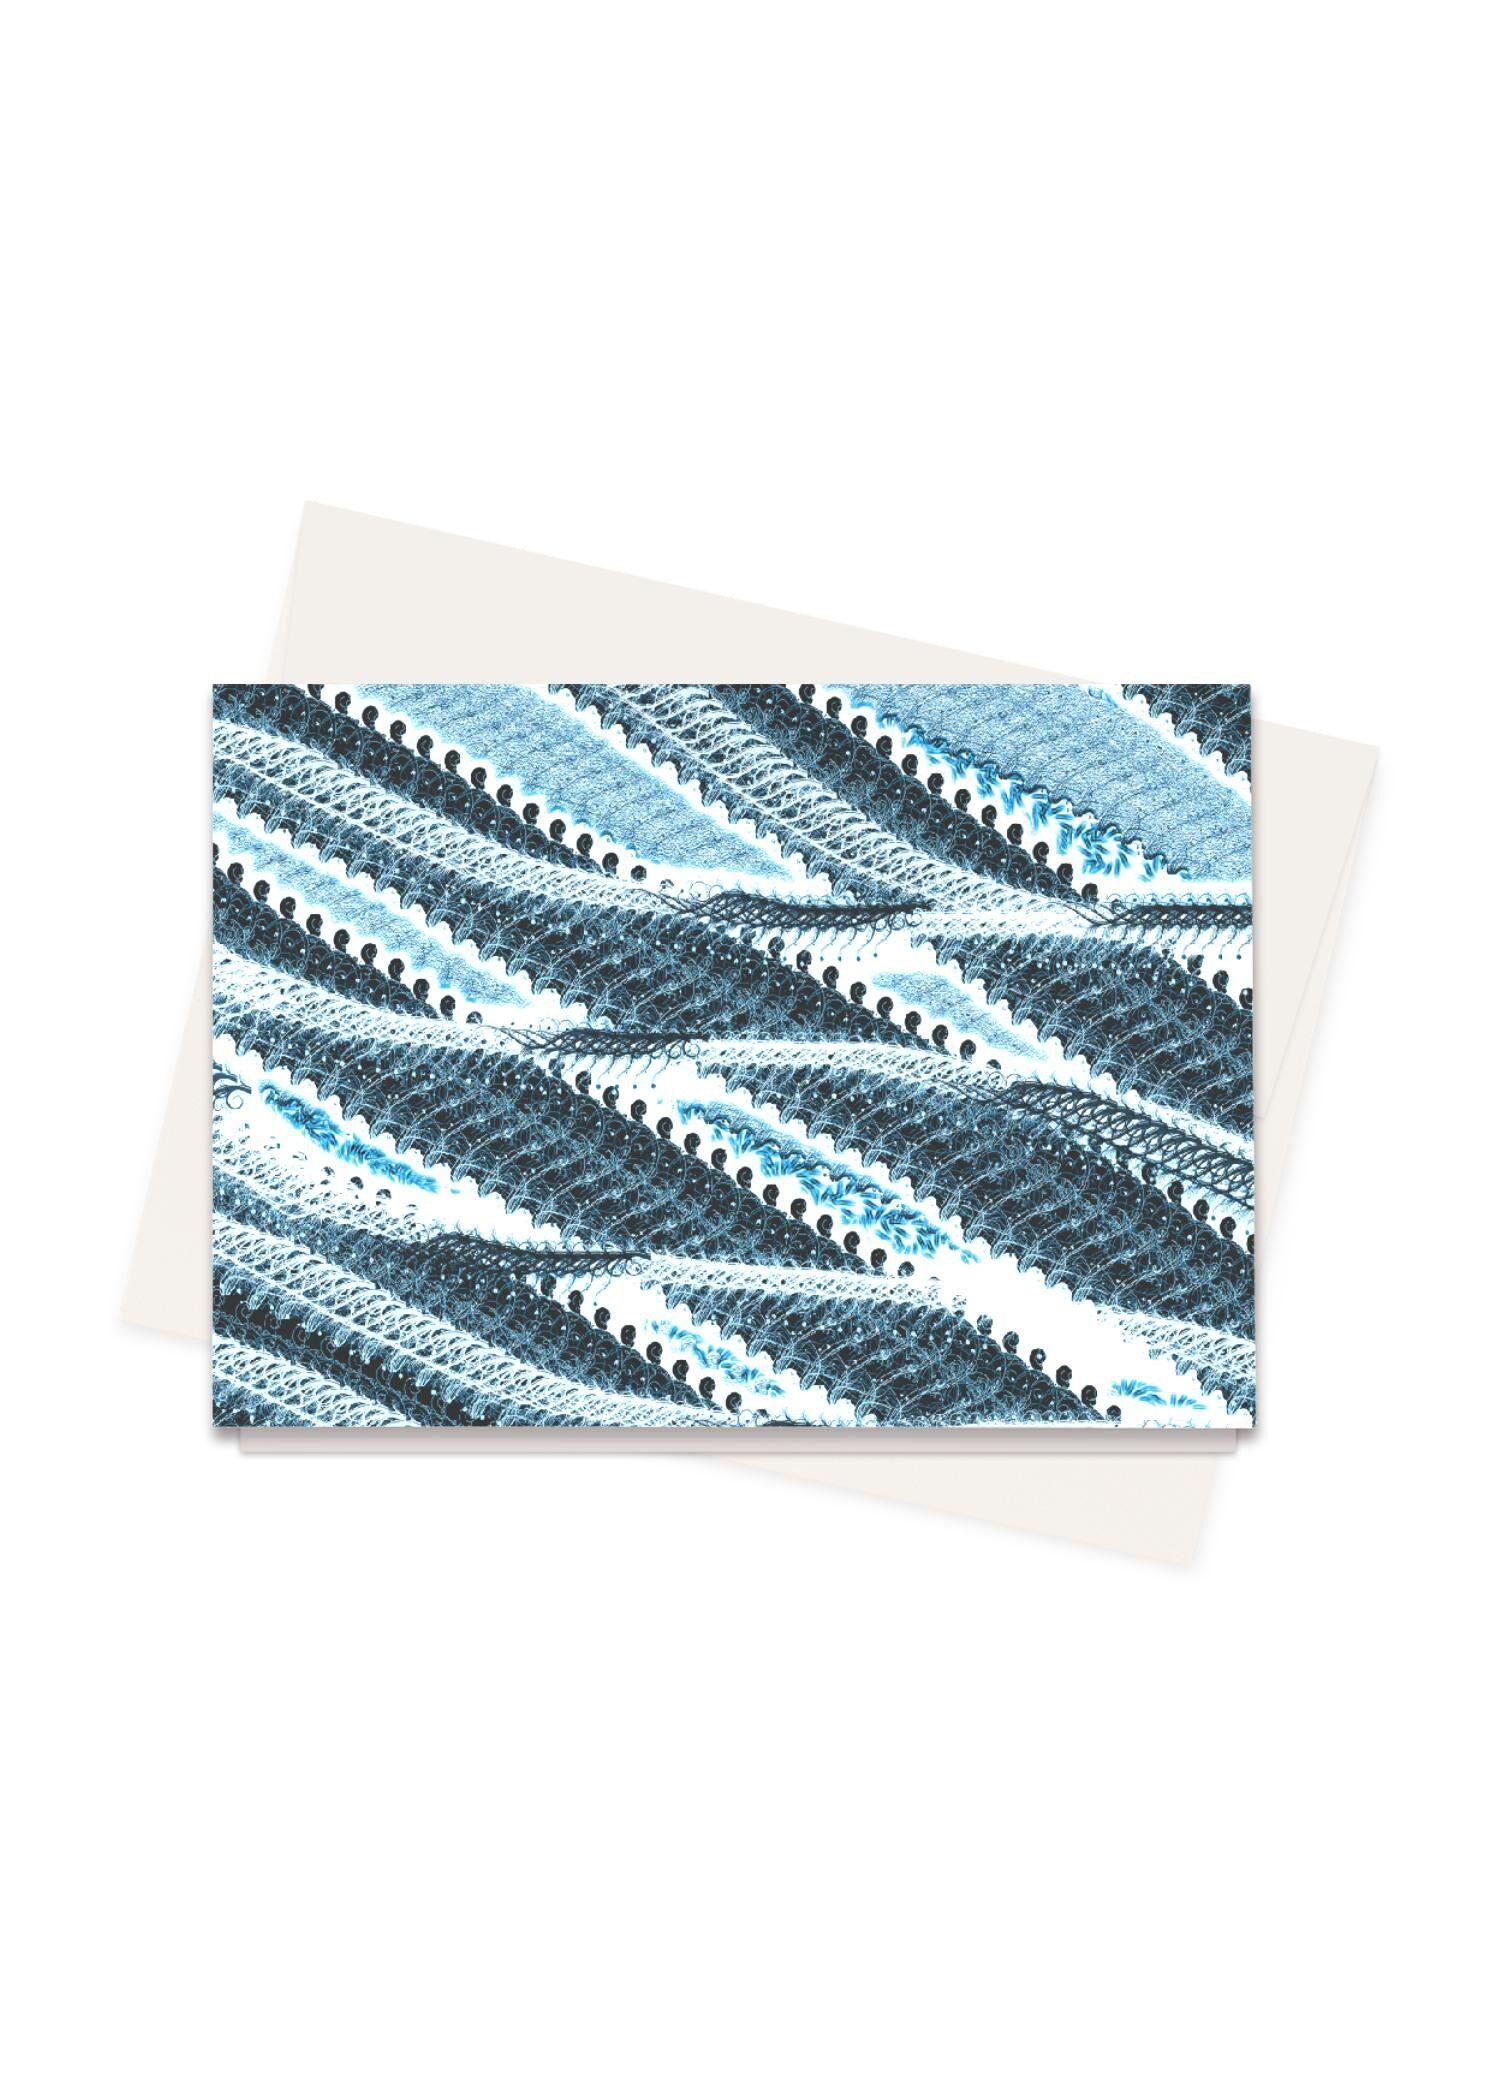 VIDA Greeting Cards Set - Arctic Waves by VIDA Original Artist  - Size: Set of 16